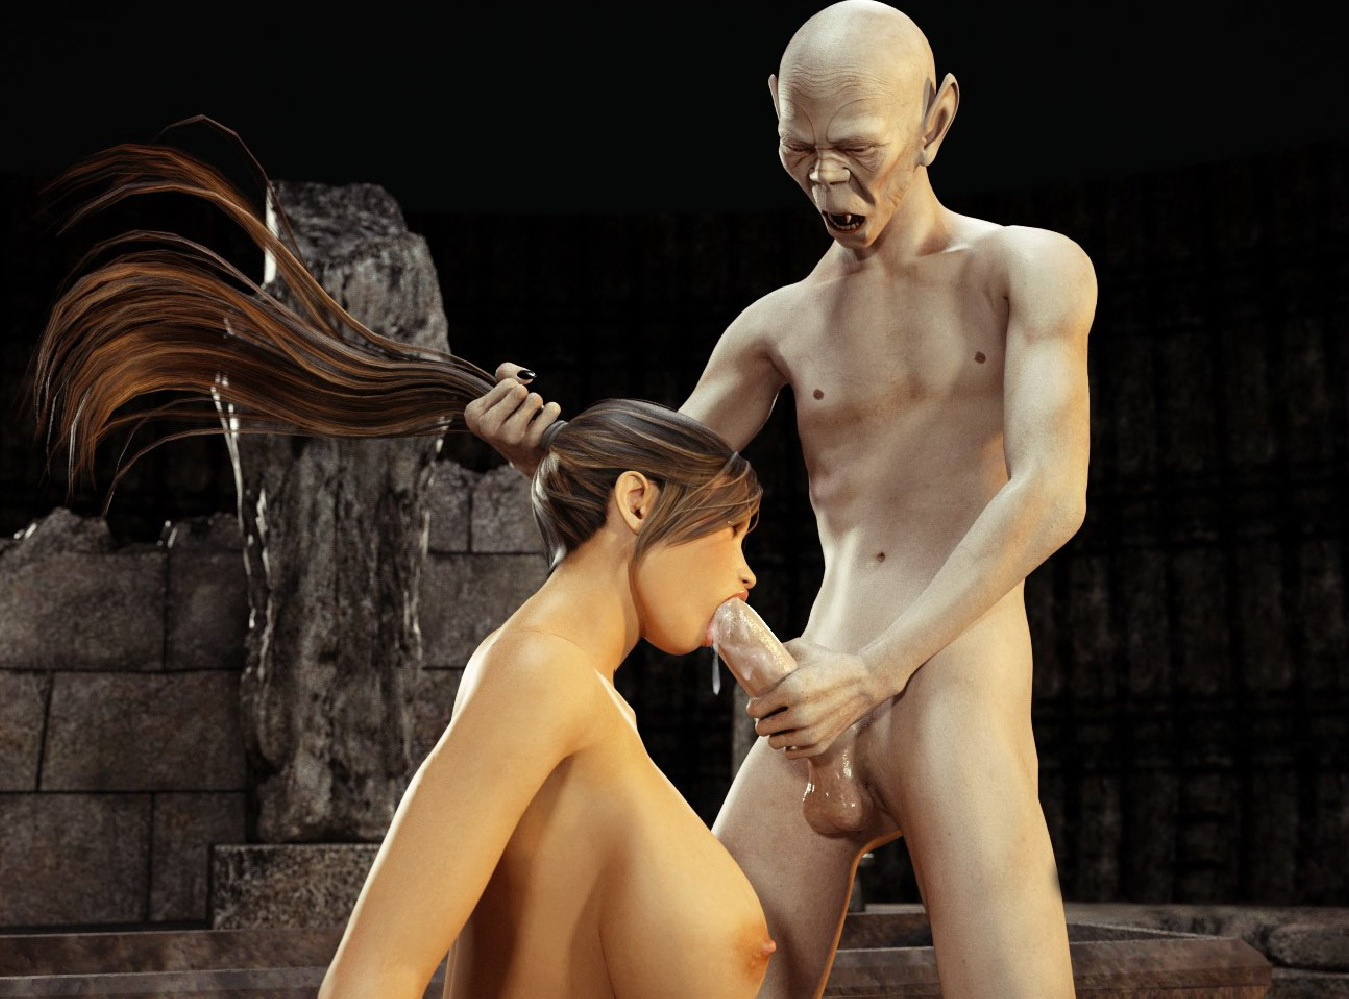 Blonde raider porn, rubbing tits fucking pussy